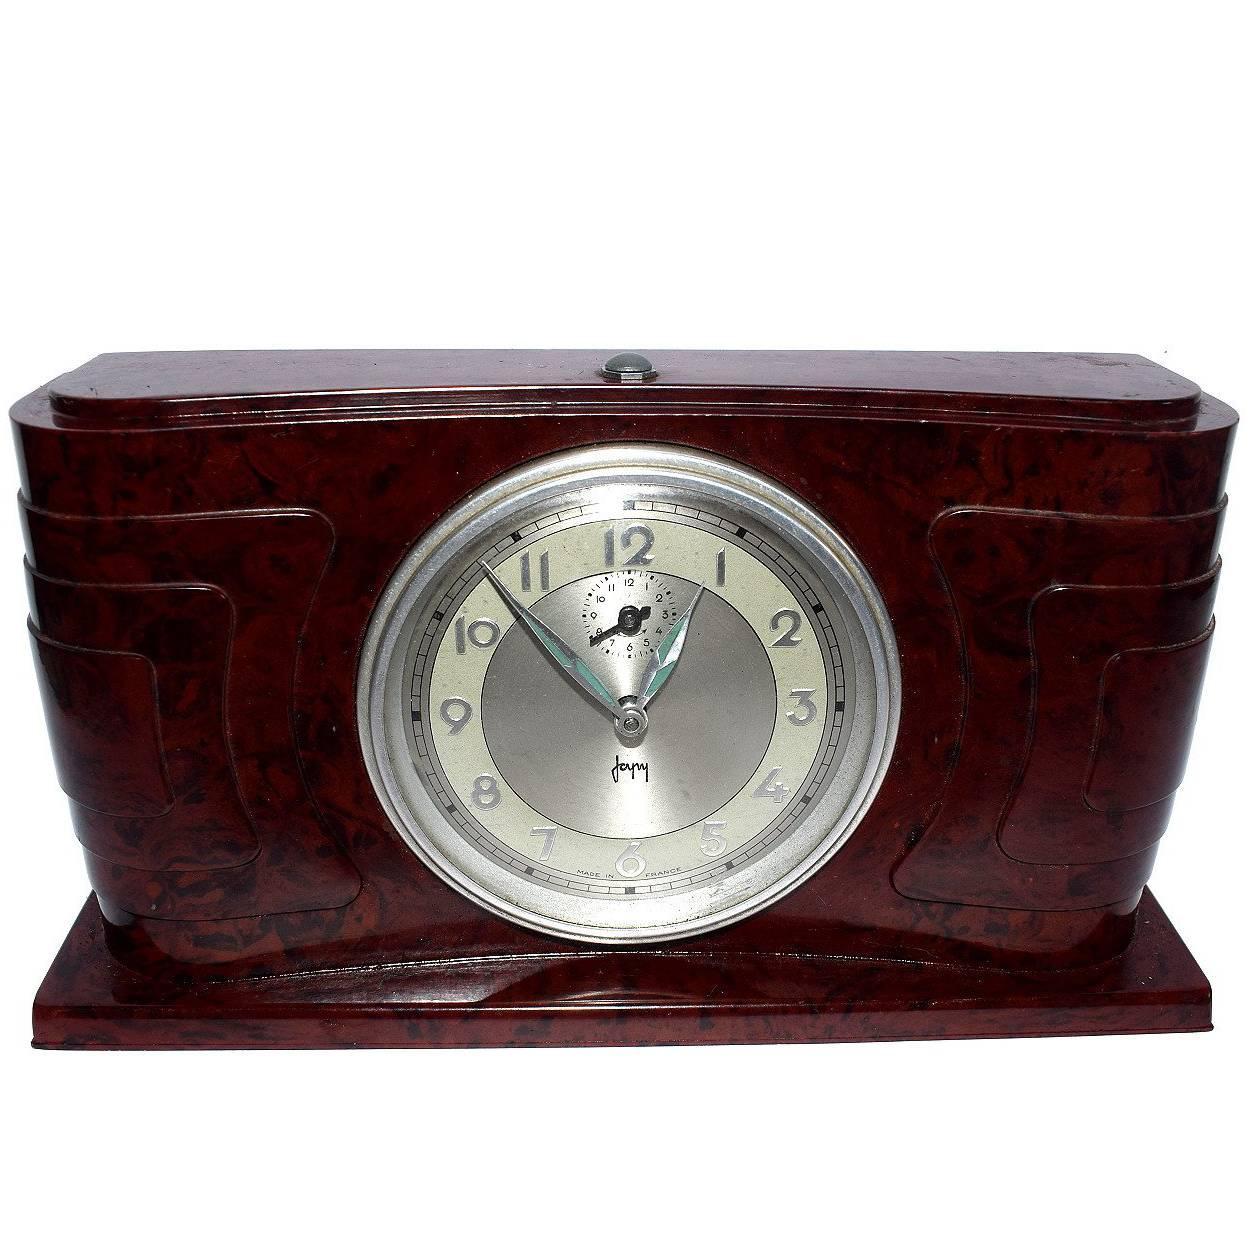 Art Deco Bakelite Streamline Clock by Japy France